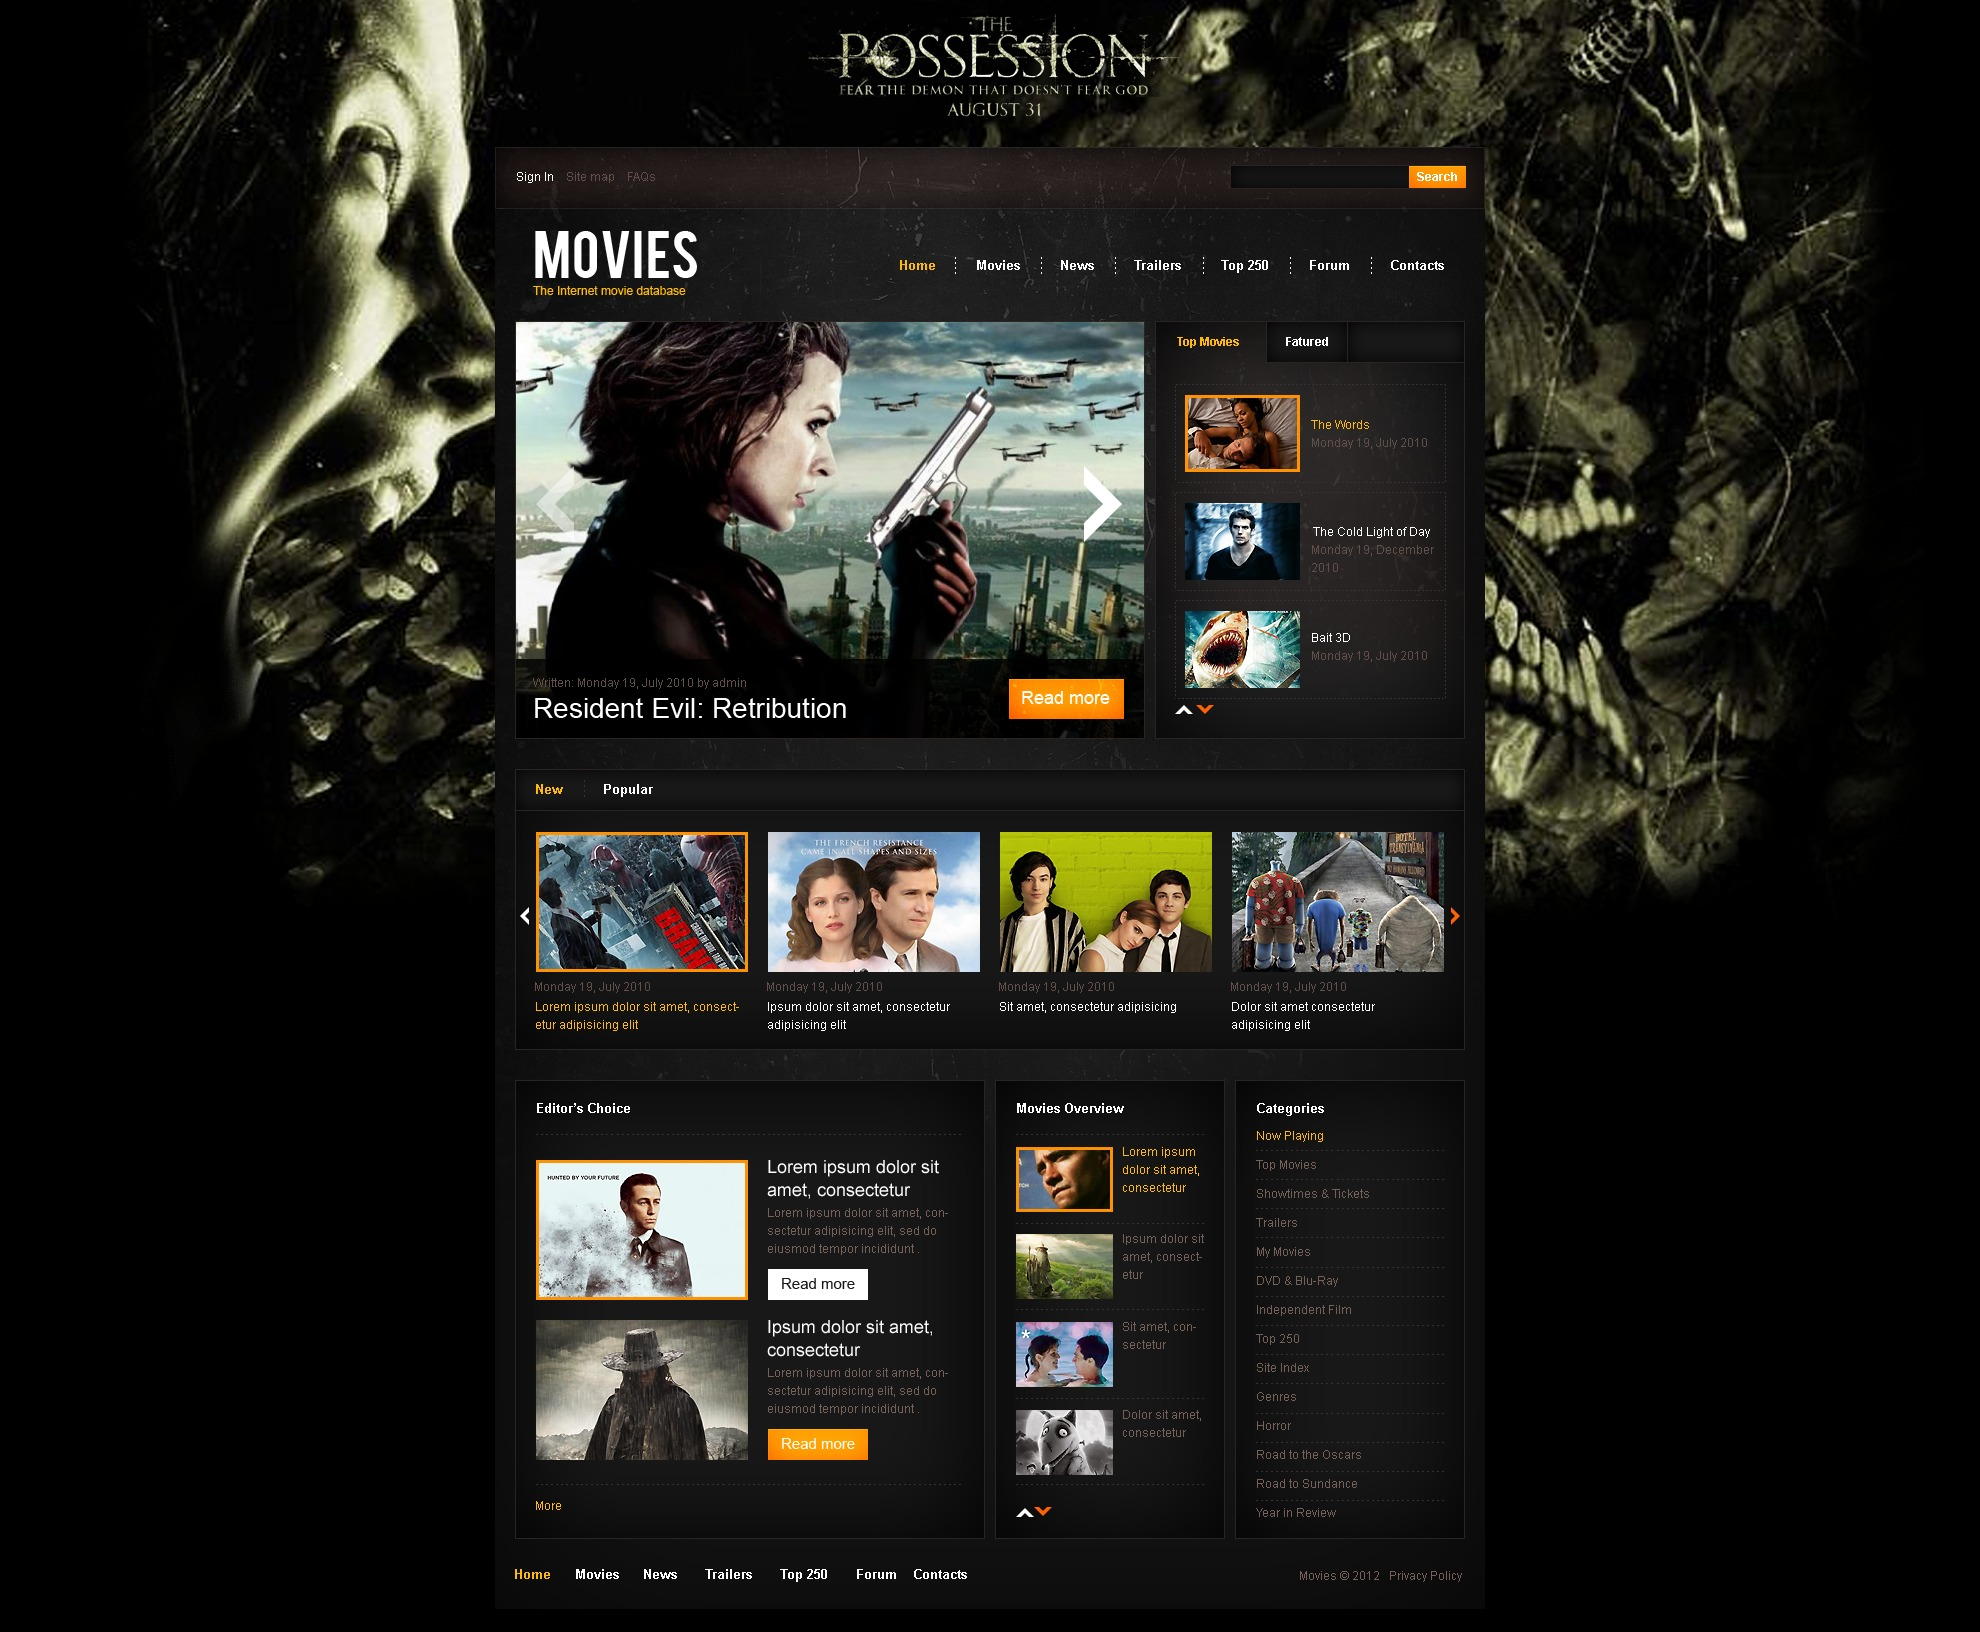 Internet Movie Database Template Drupal №44056 - captura de tela